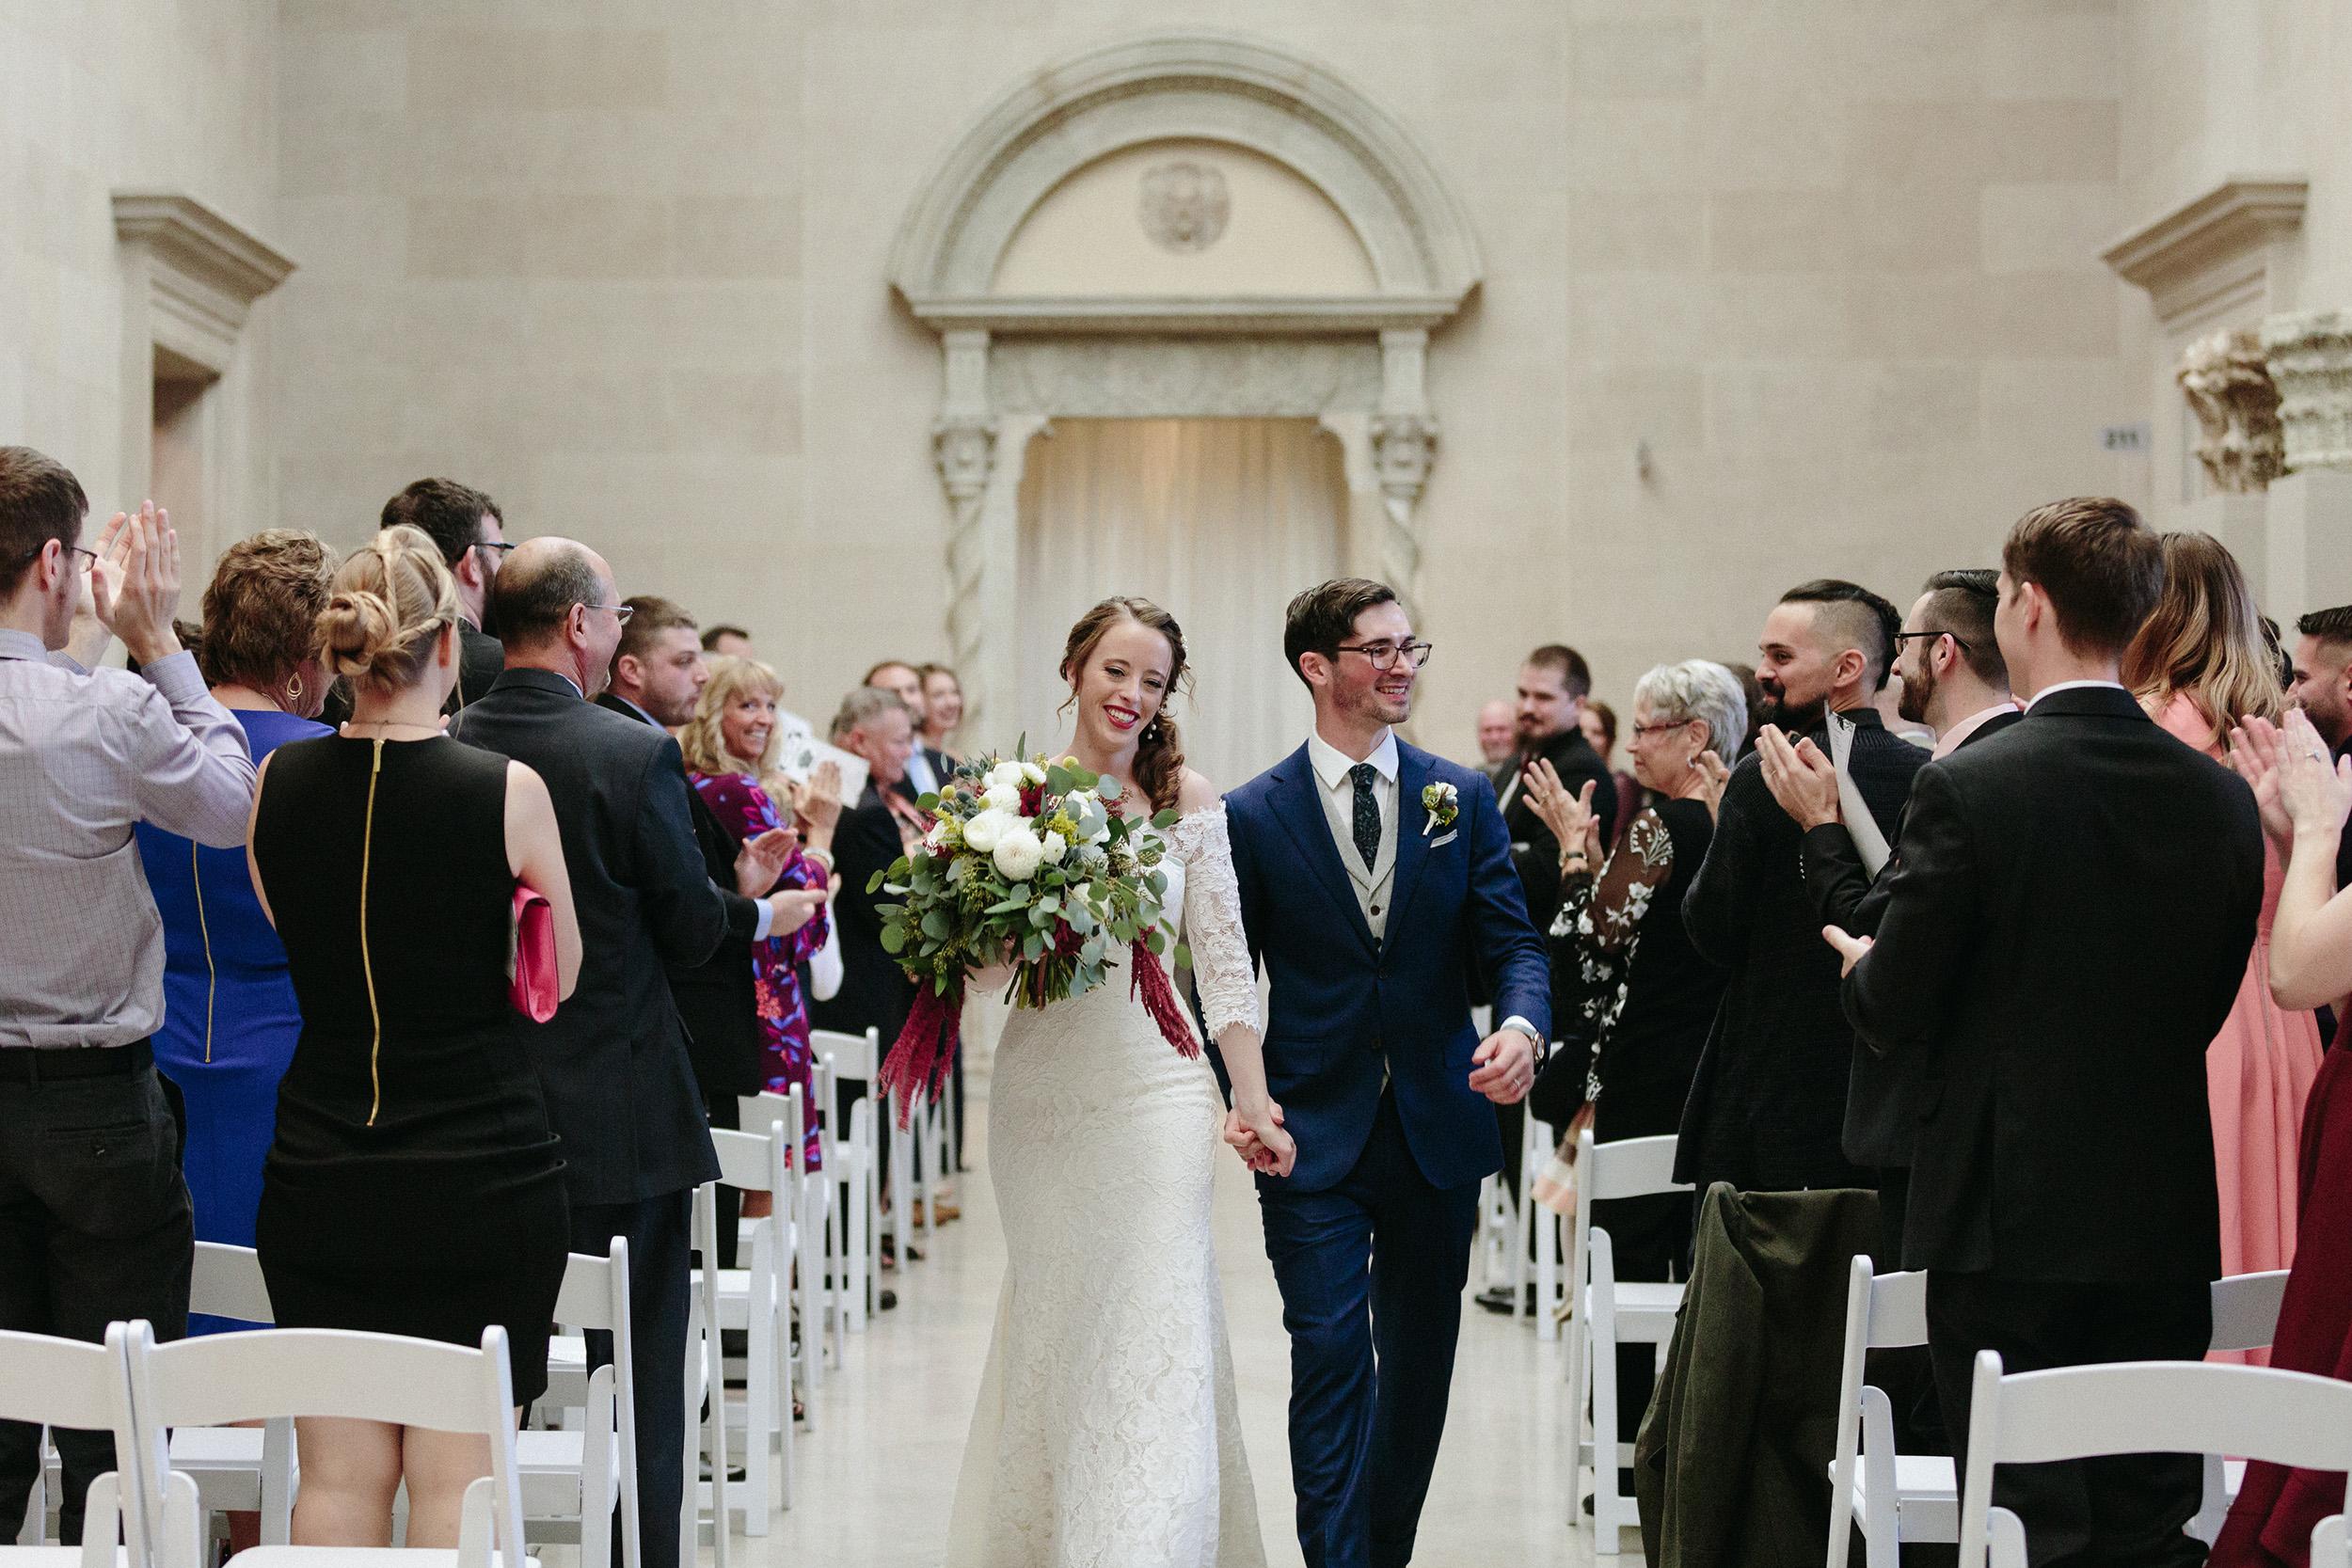 KarliCadel-Wedding-RachelChad-0061.jpg